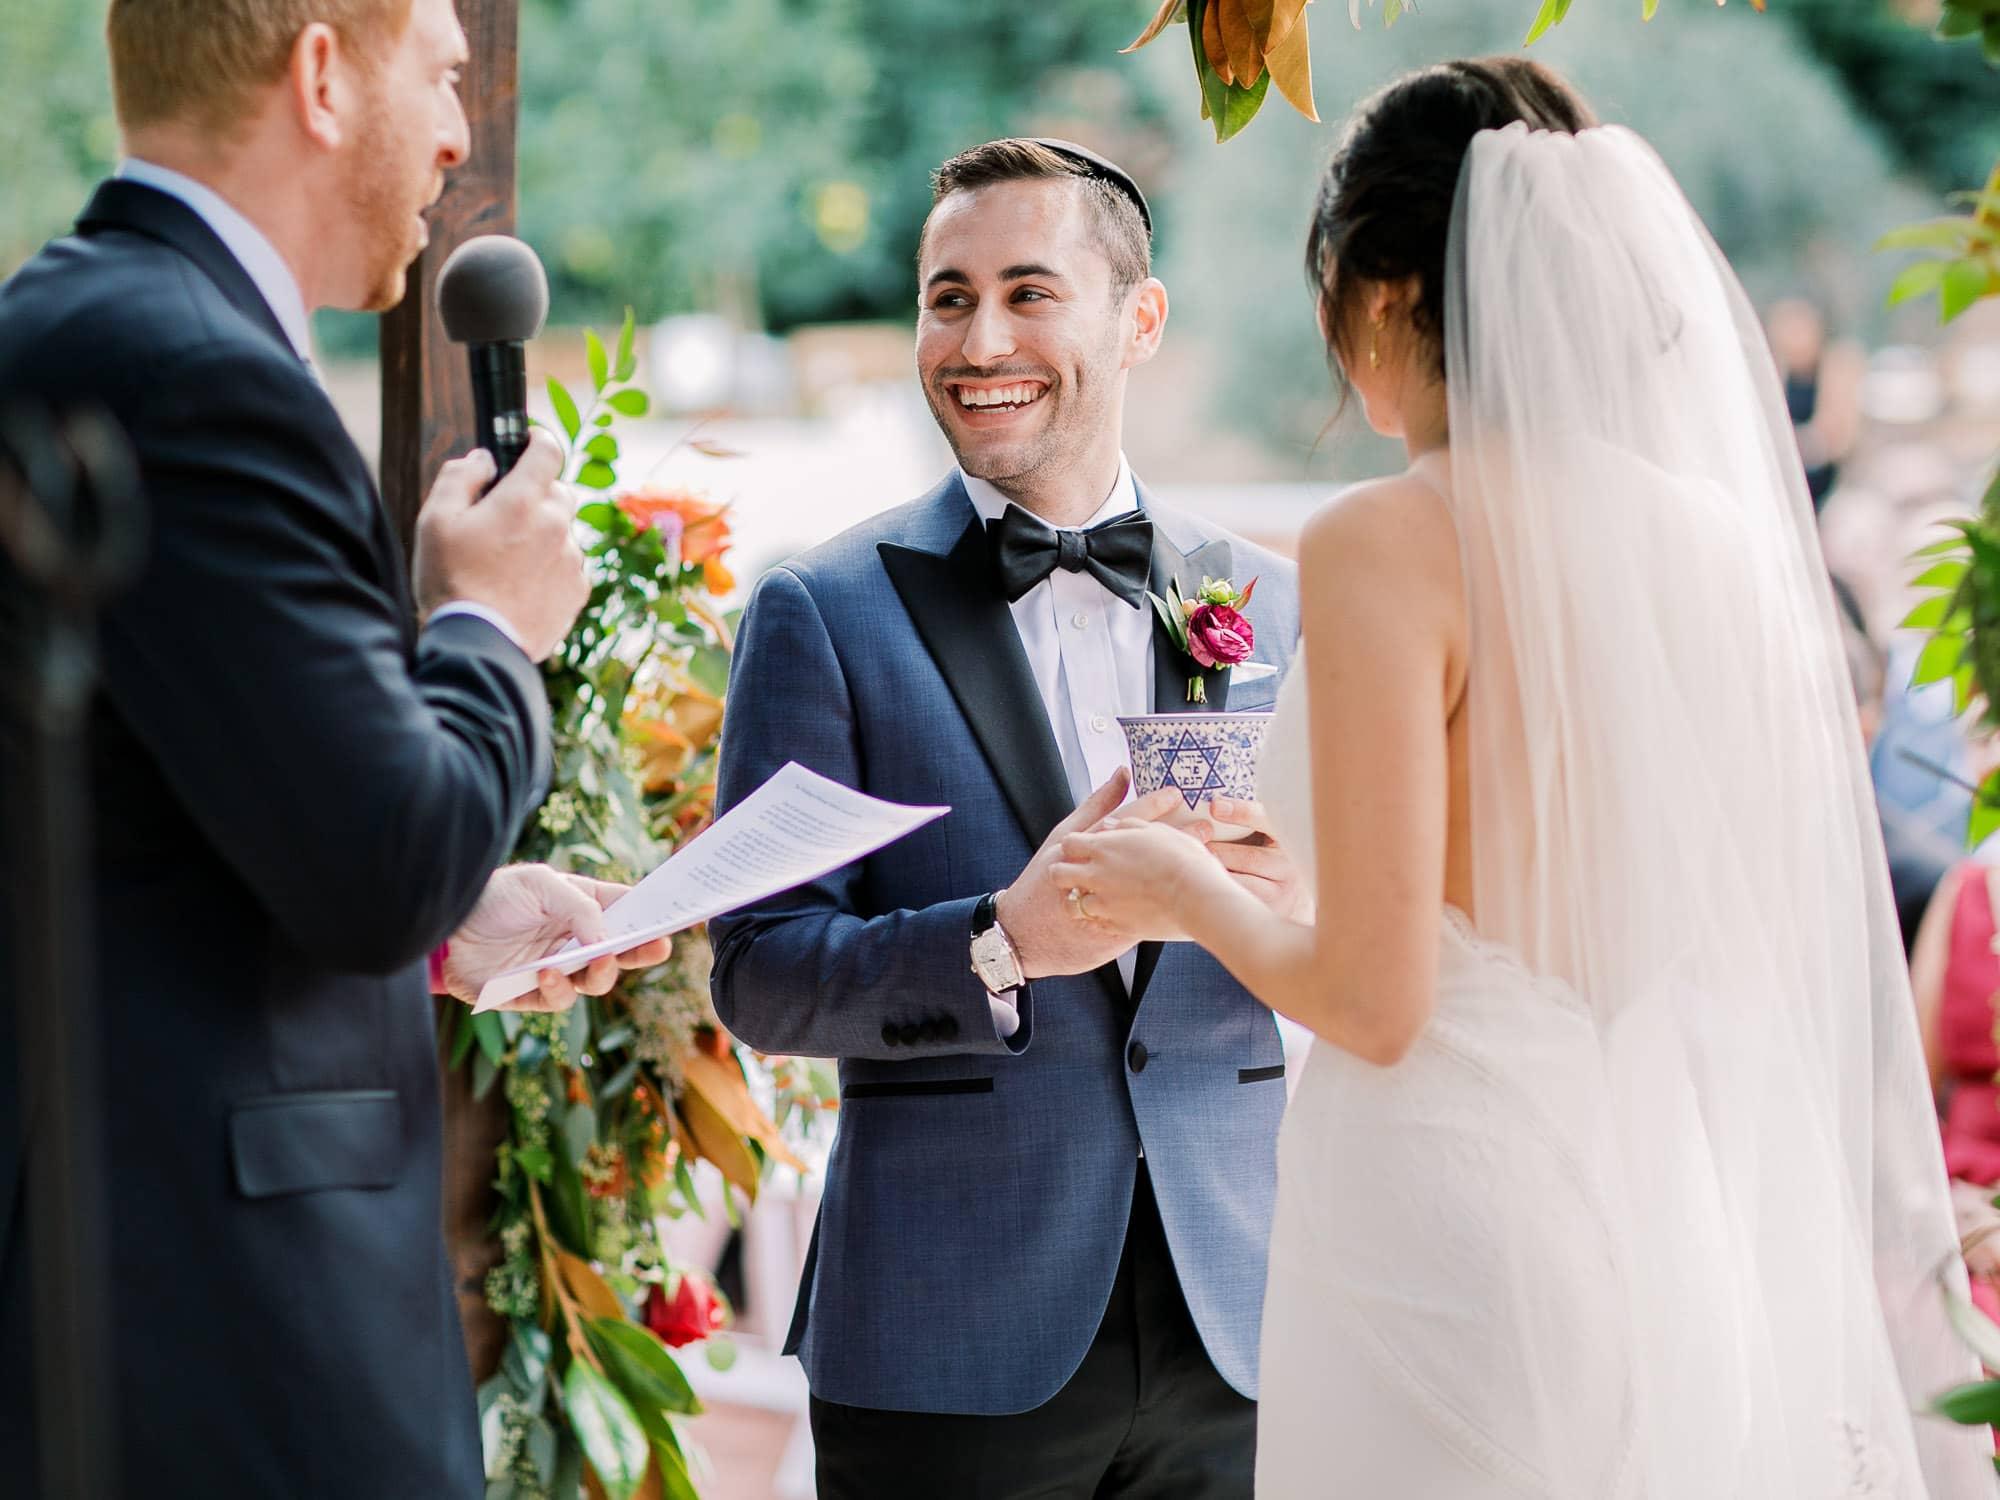 Wedding-Ring-Exchange-Greg-Ross